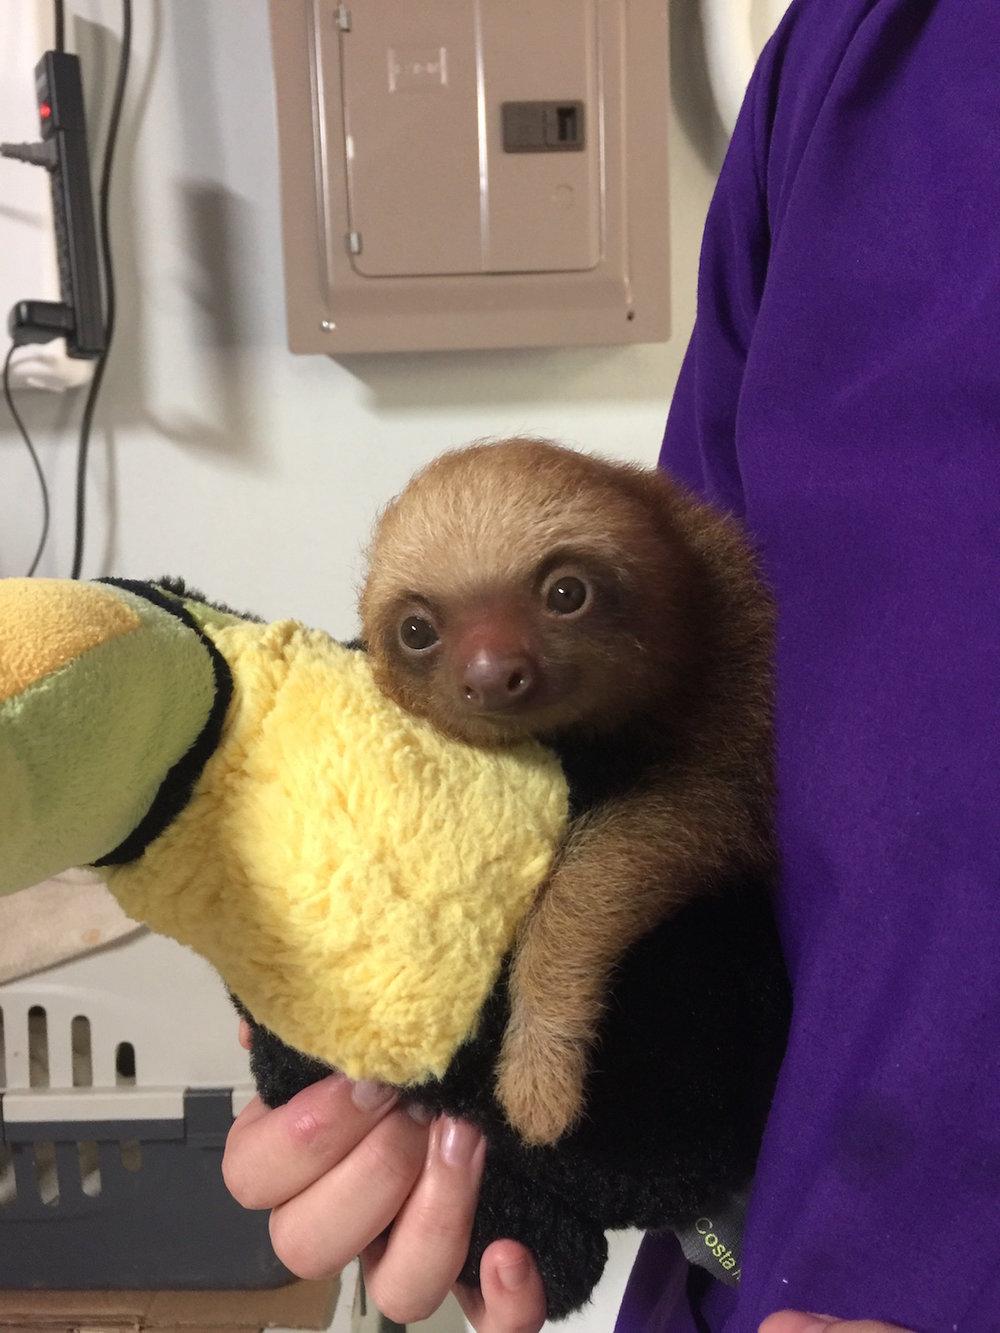 Costa-Rica-animal-rescue-sloth.jpg